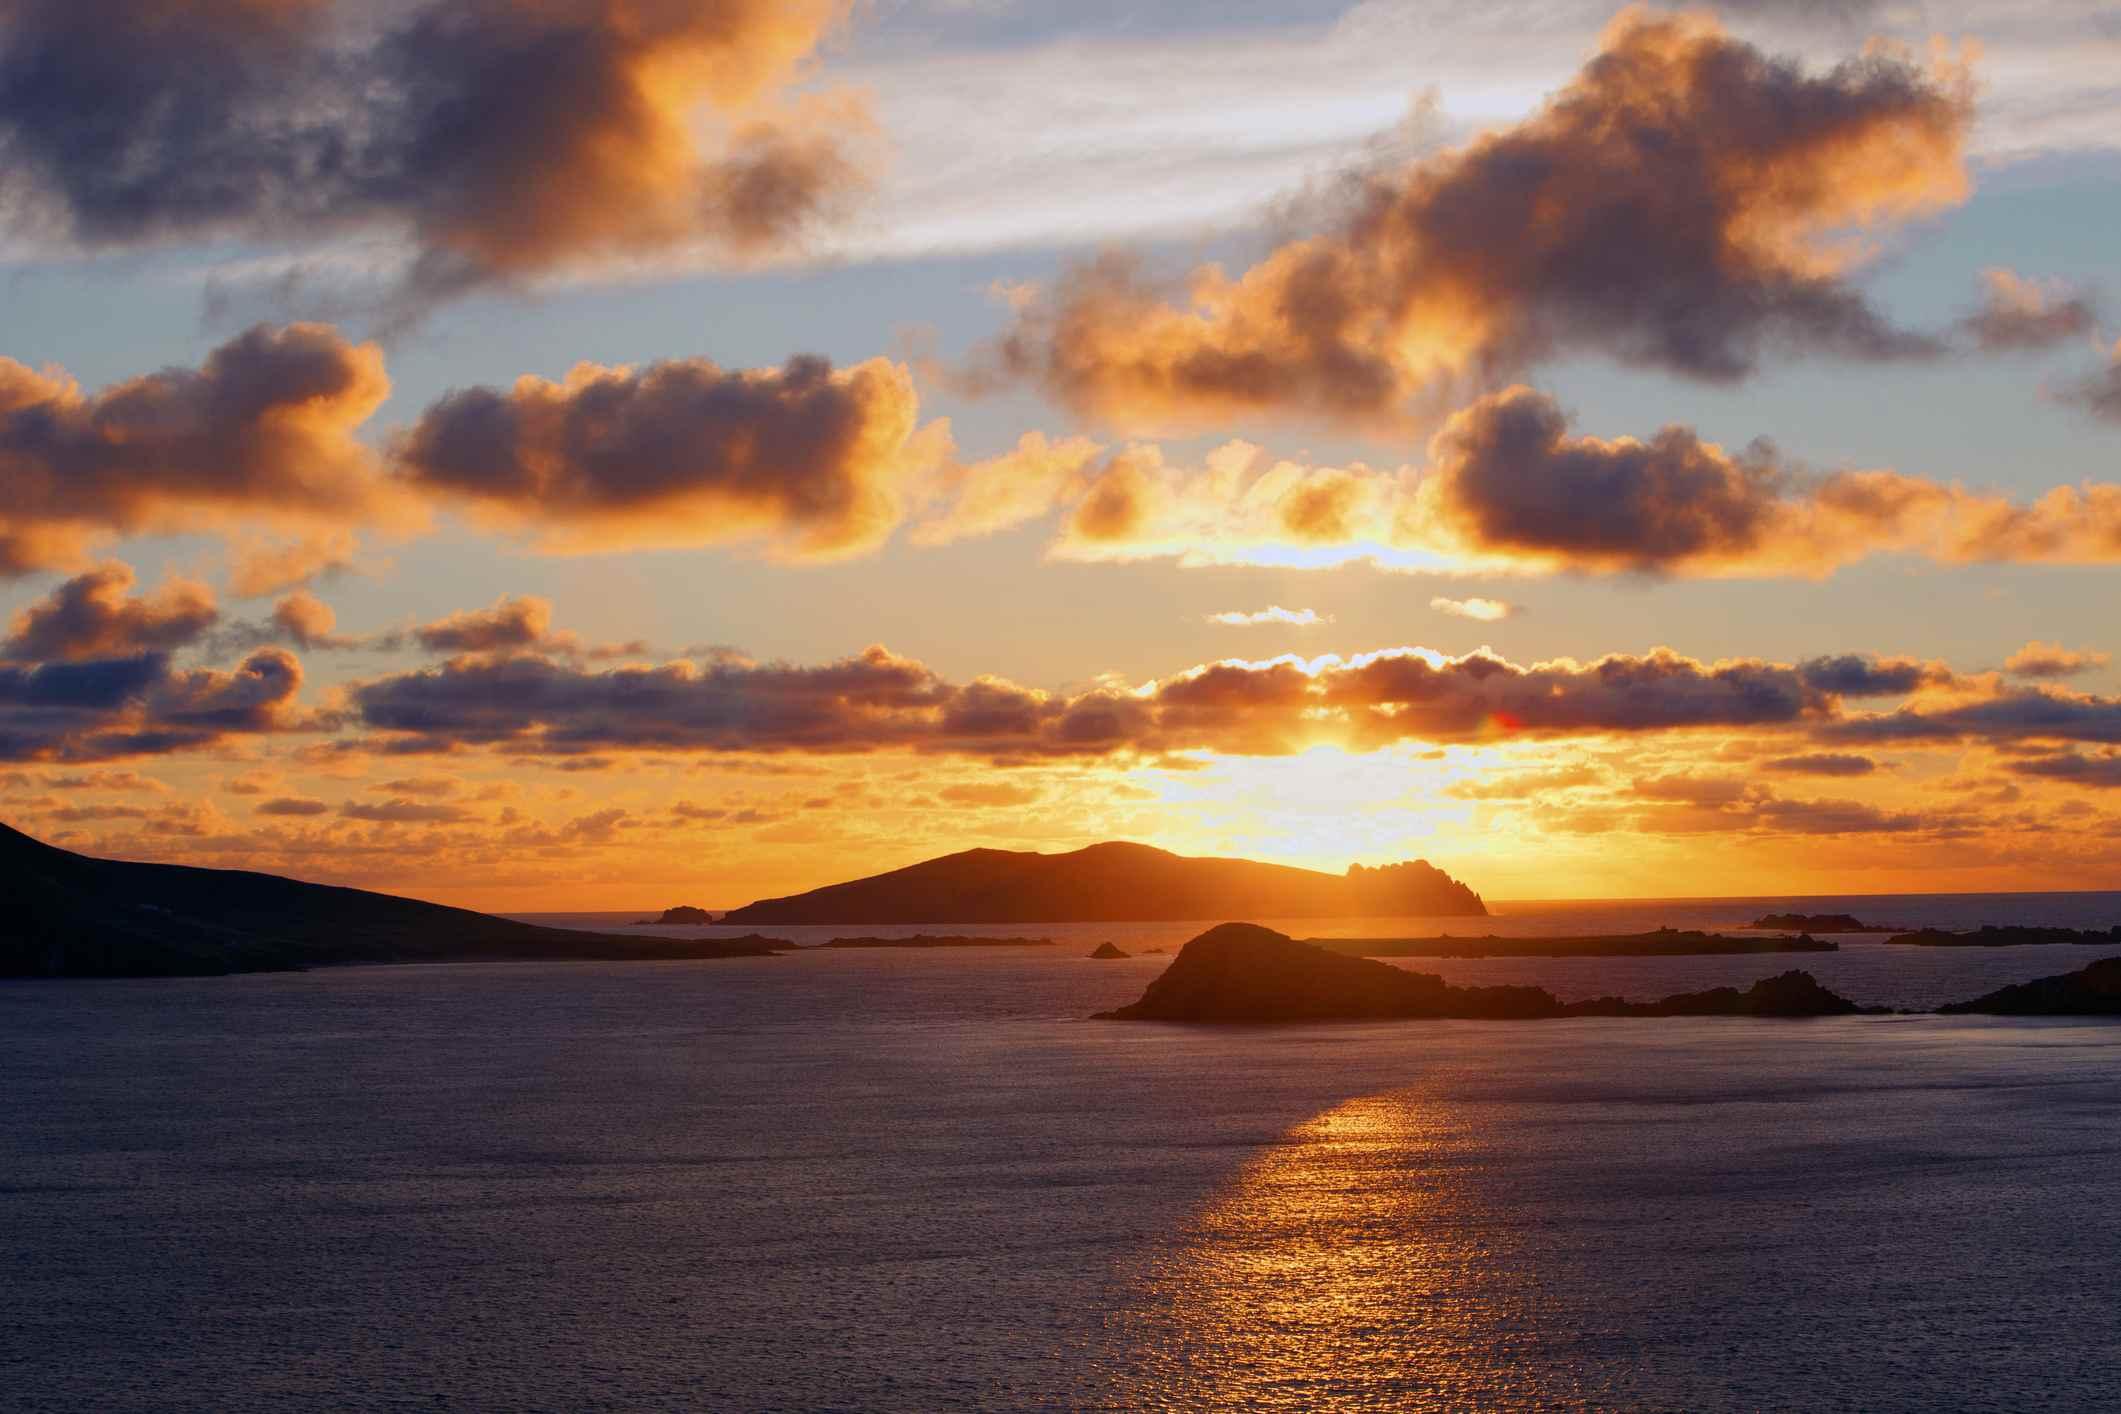 Sunset on Irish islands